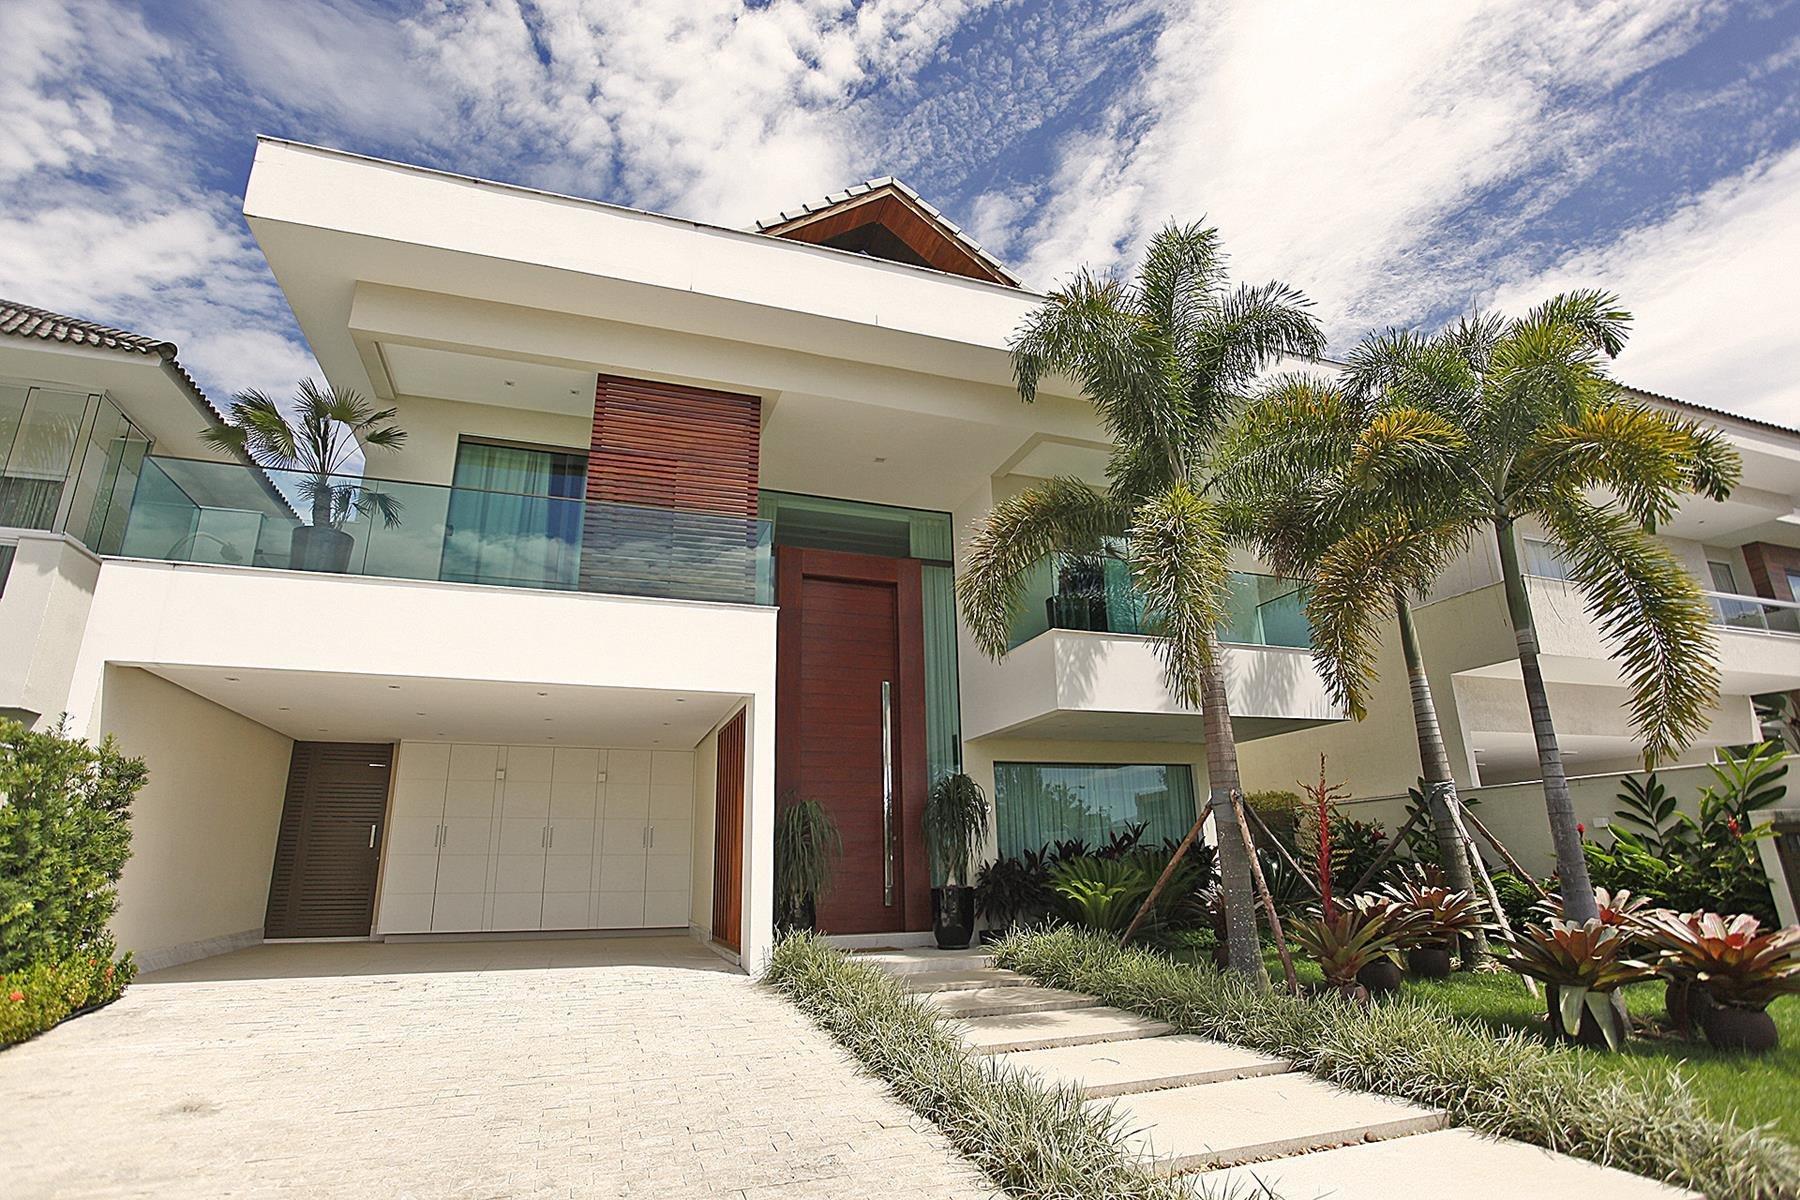 Eigentumswohnung in Rio de Janeiro, Brasilien 1